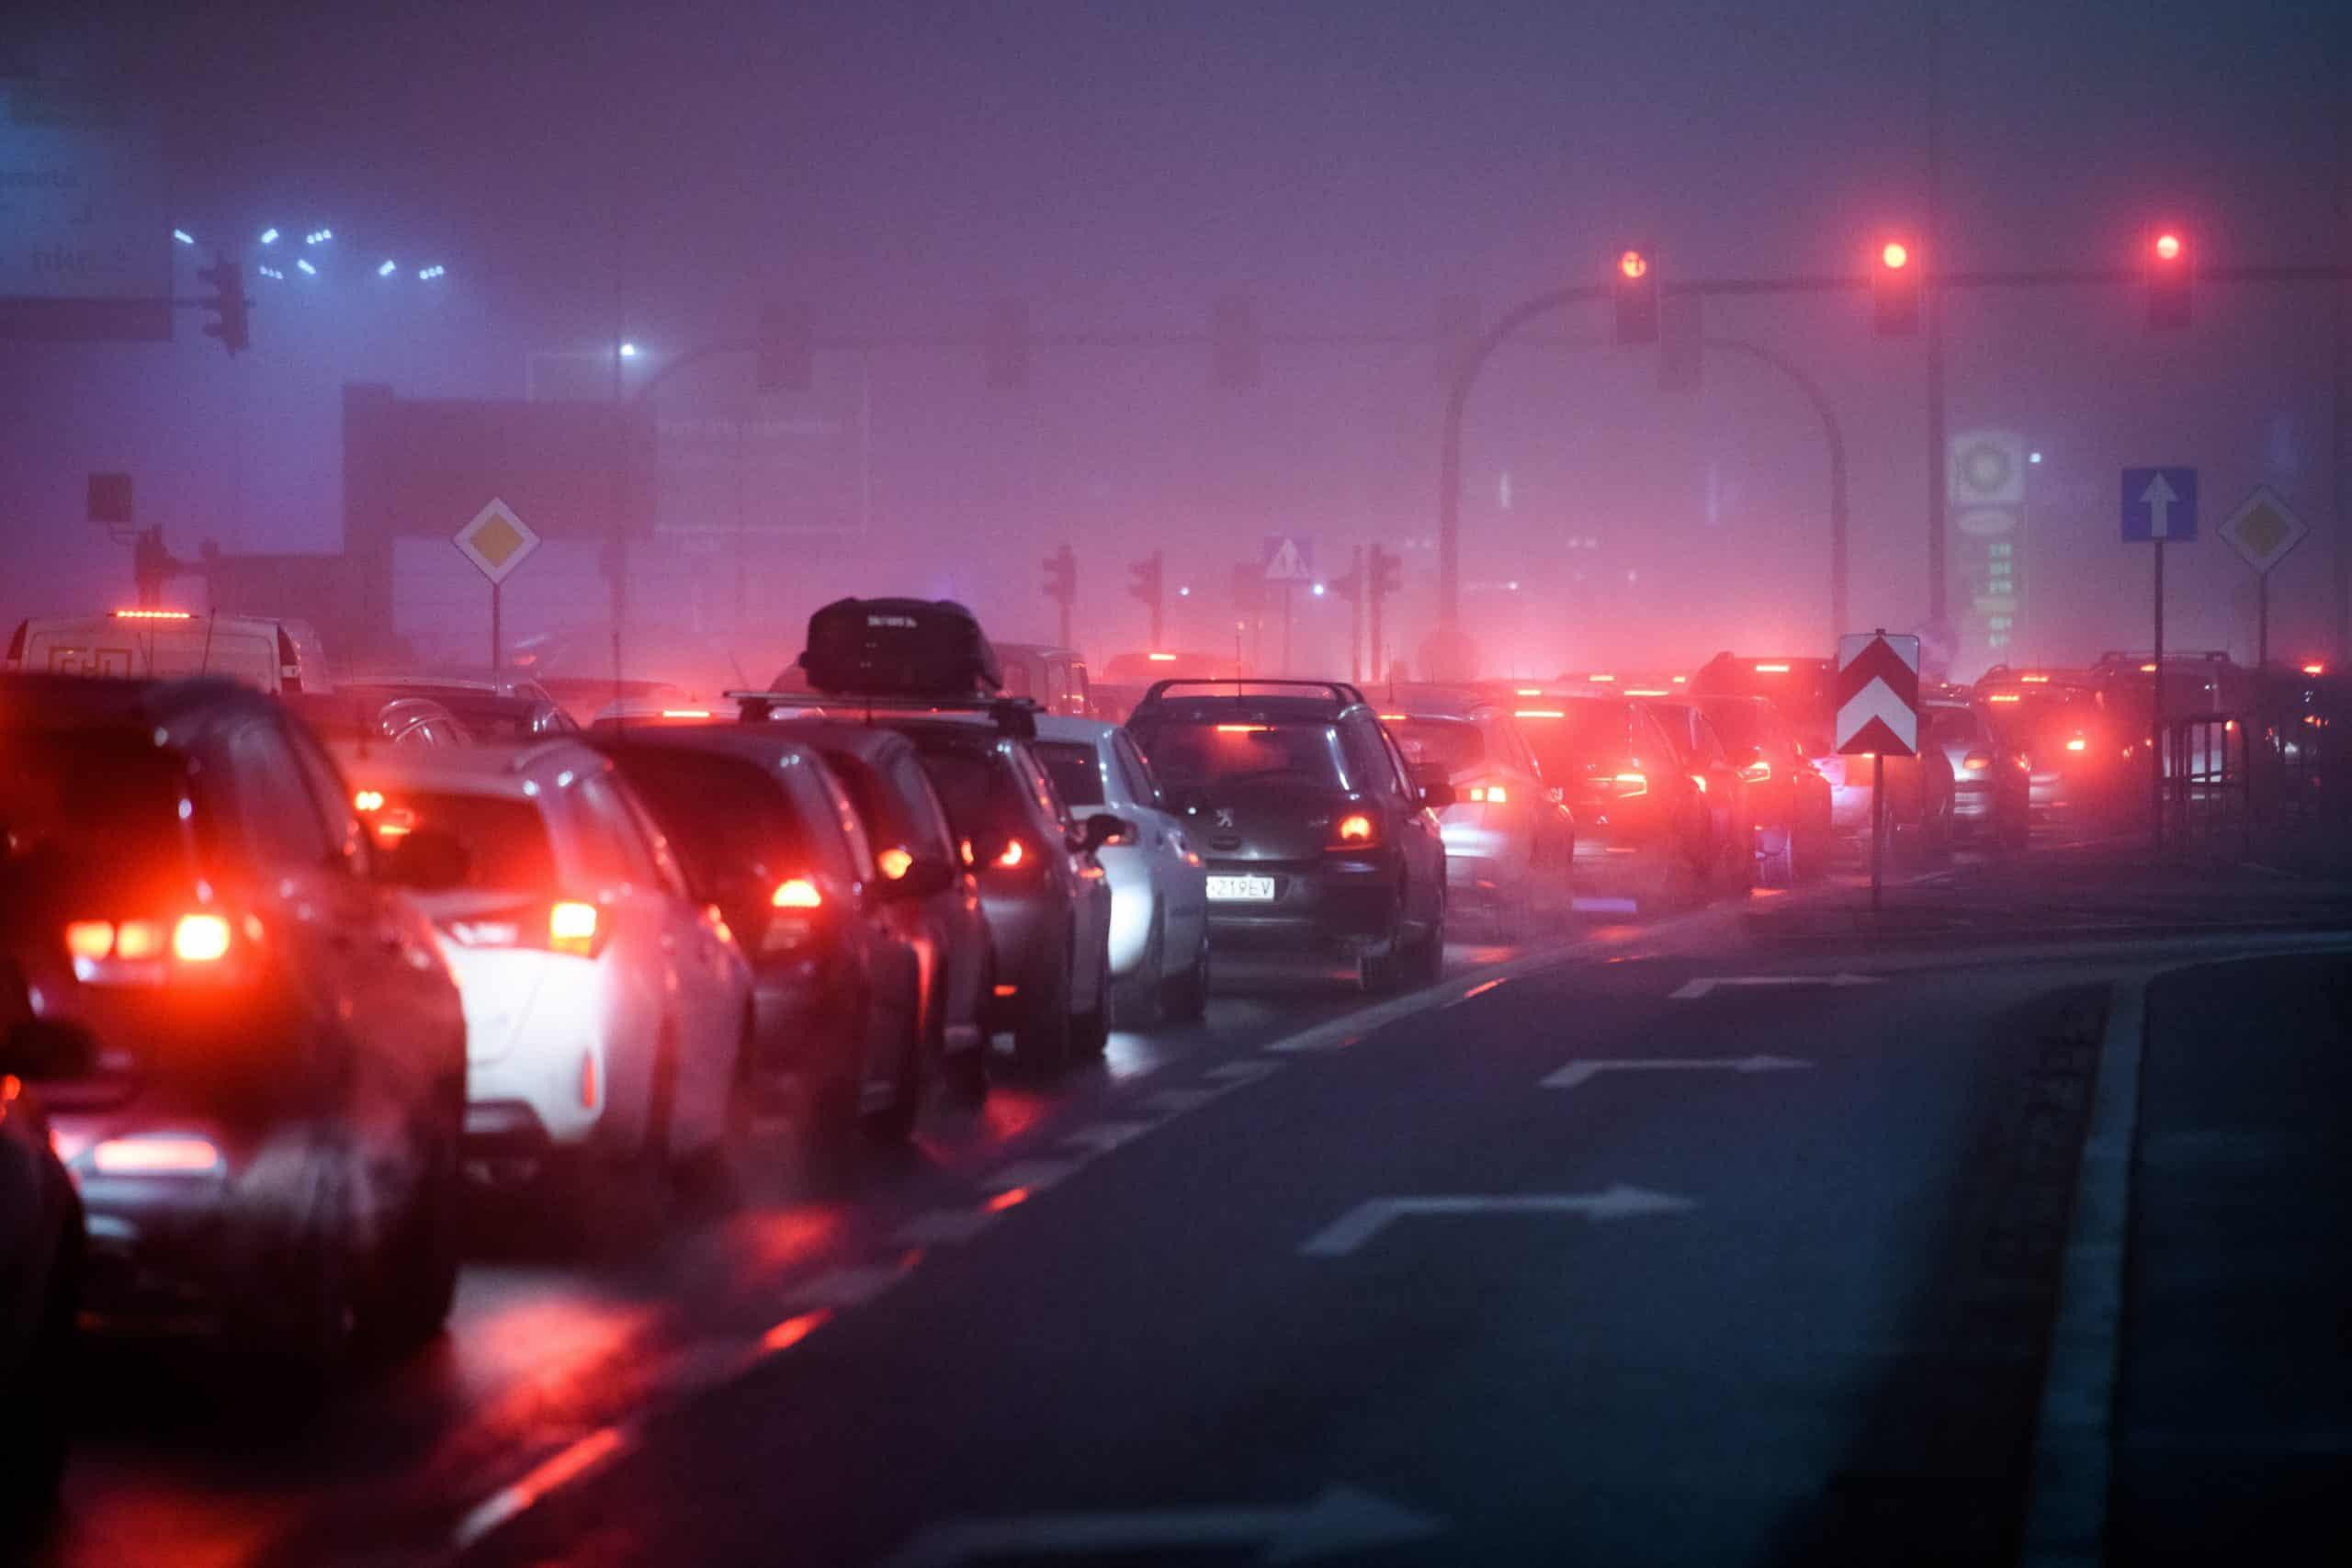 Night traffic jam at red light